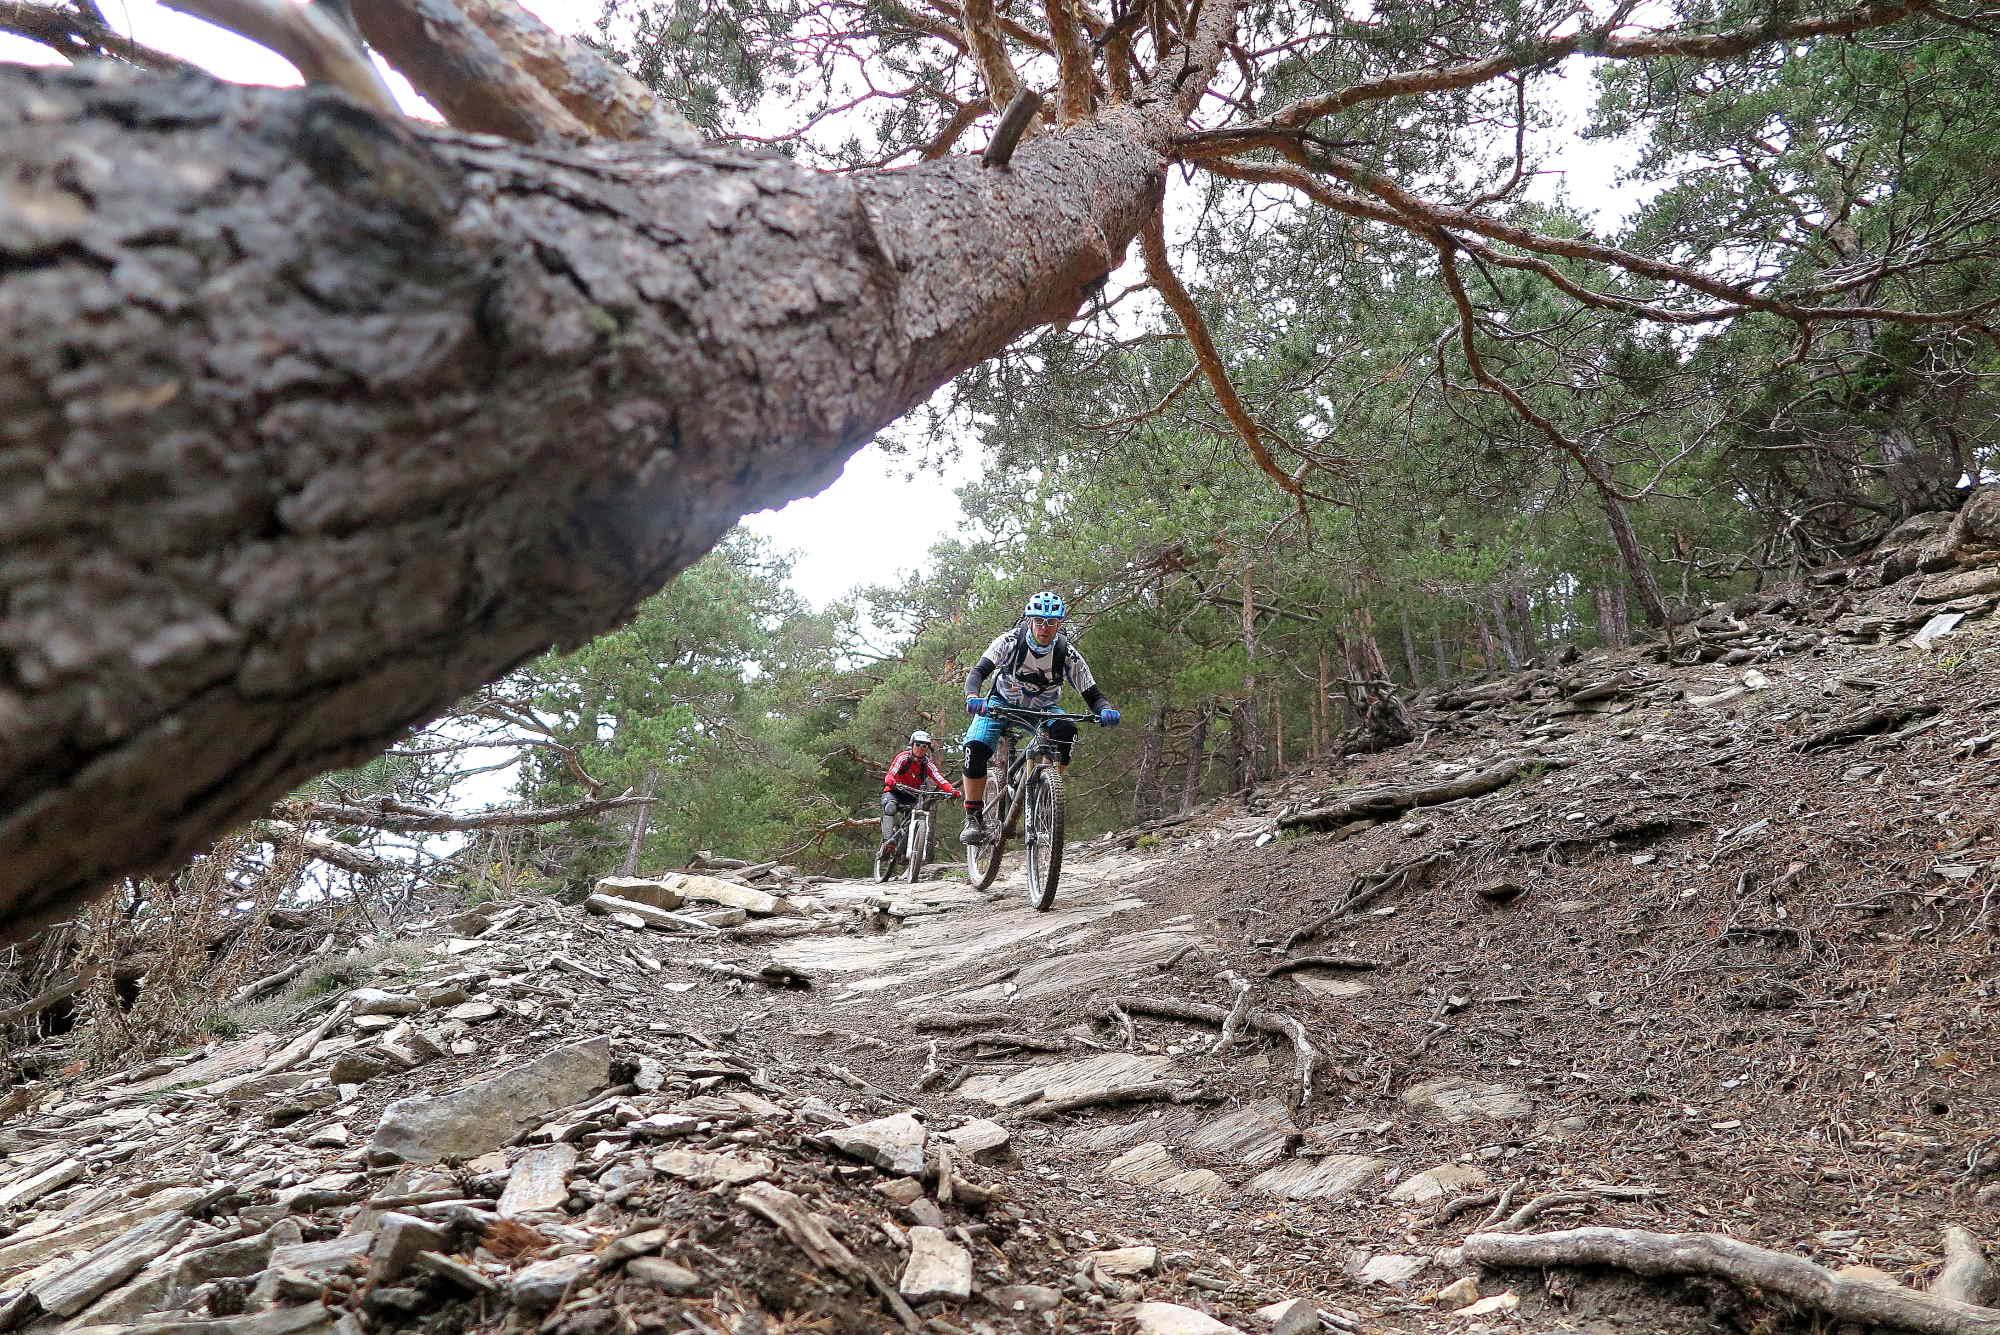 Ride Alpine Trails Mountainbike Freeride & Enduro Camp MTB Freeride Alpencross Westalpen Ride on